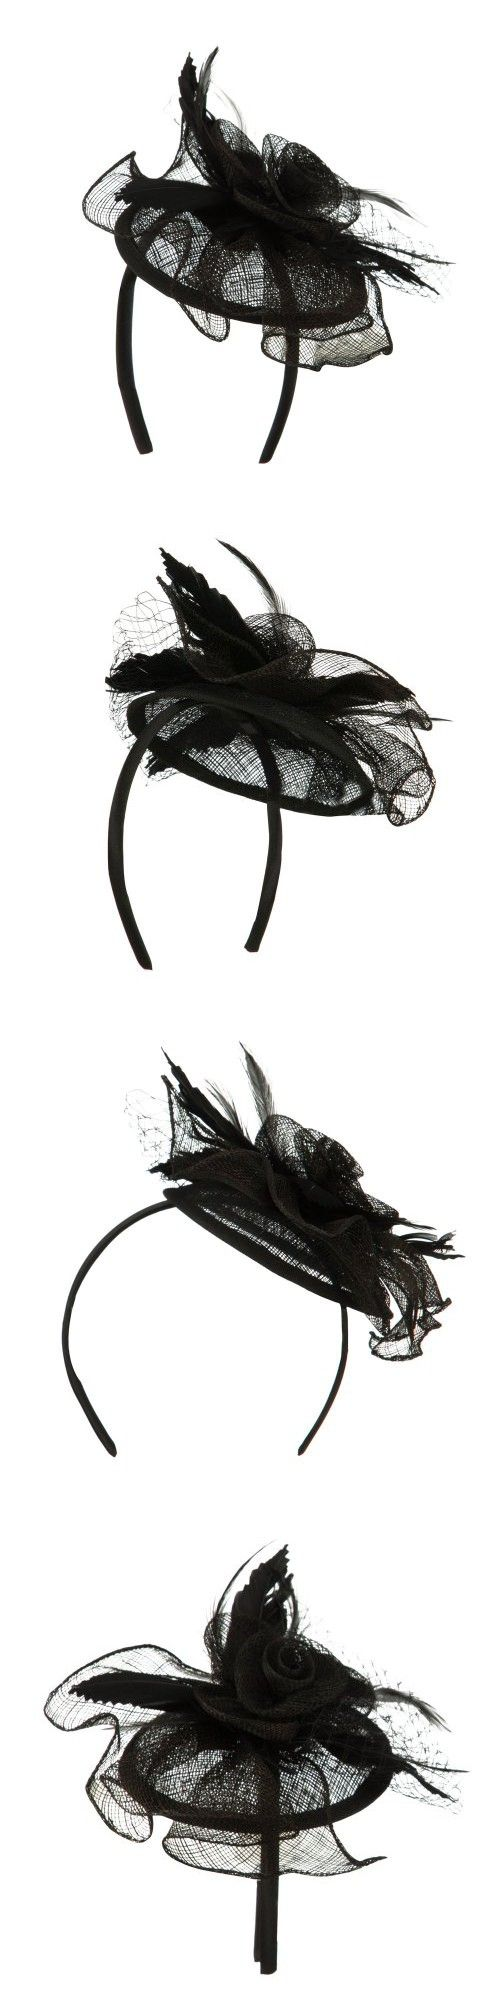 Women's Round Rose Headband Fascinator - Black OSFM